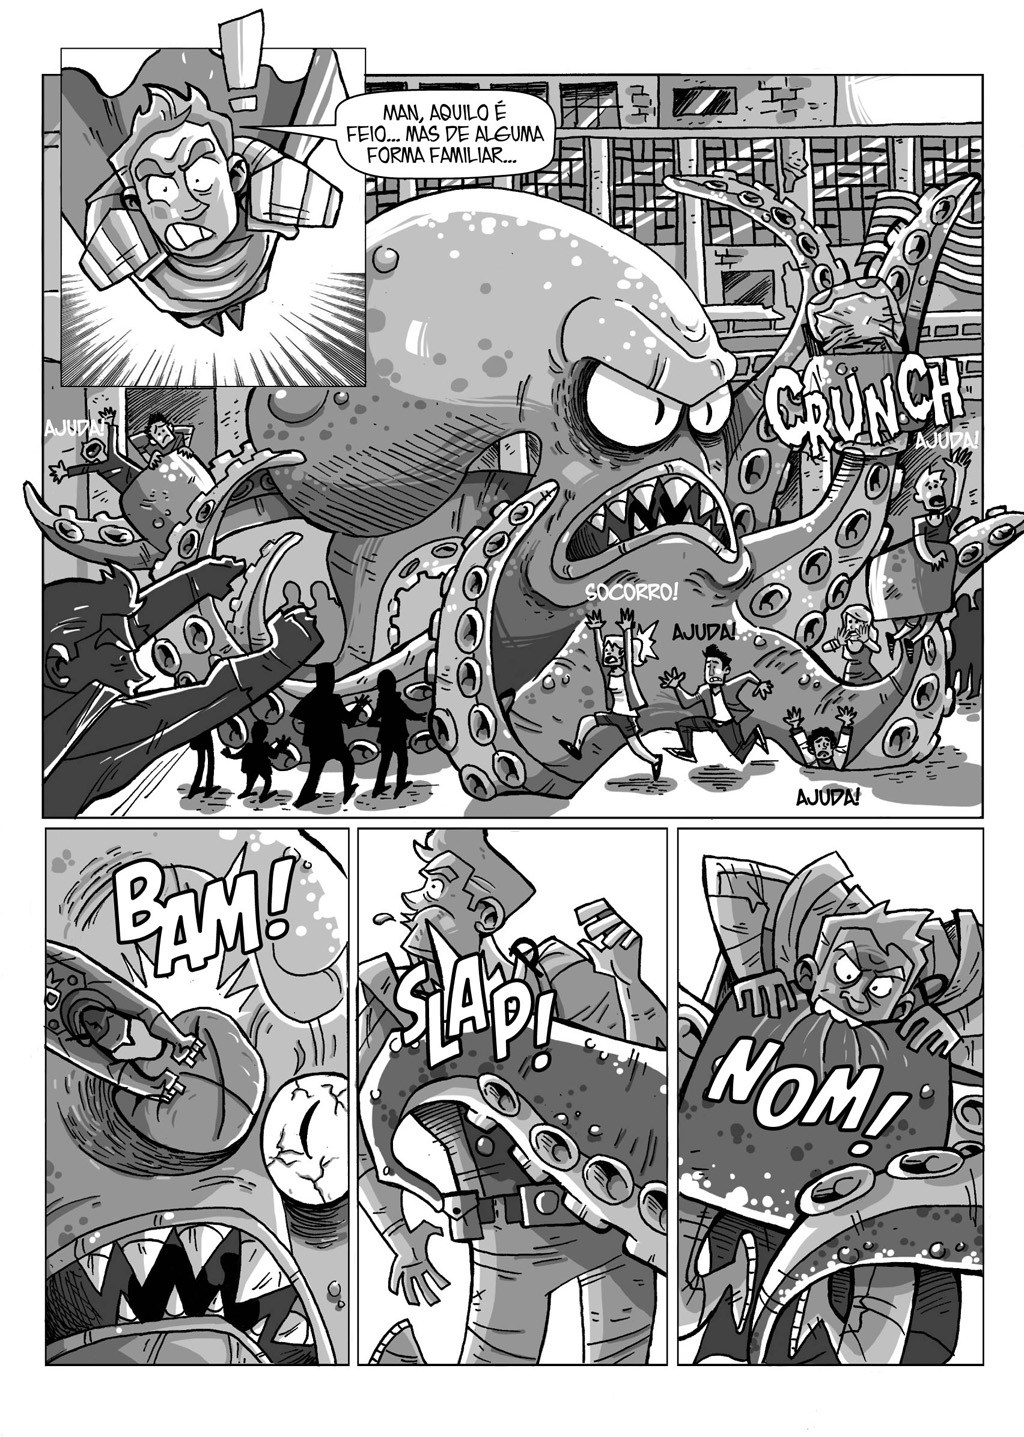 Portento - Página 4